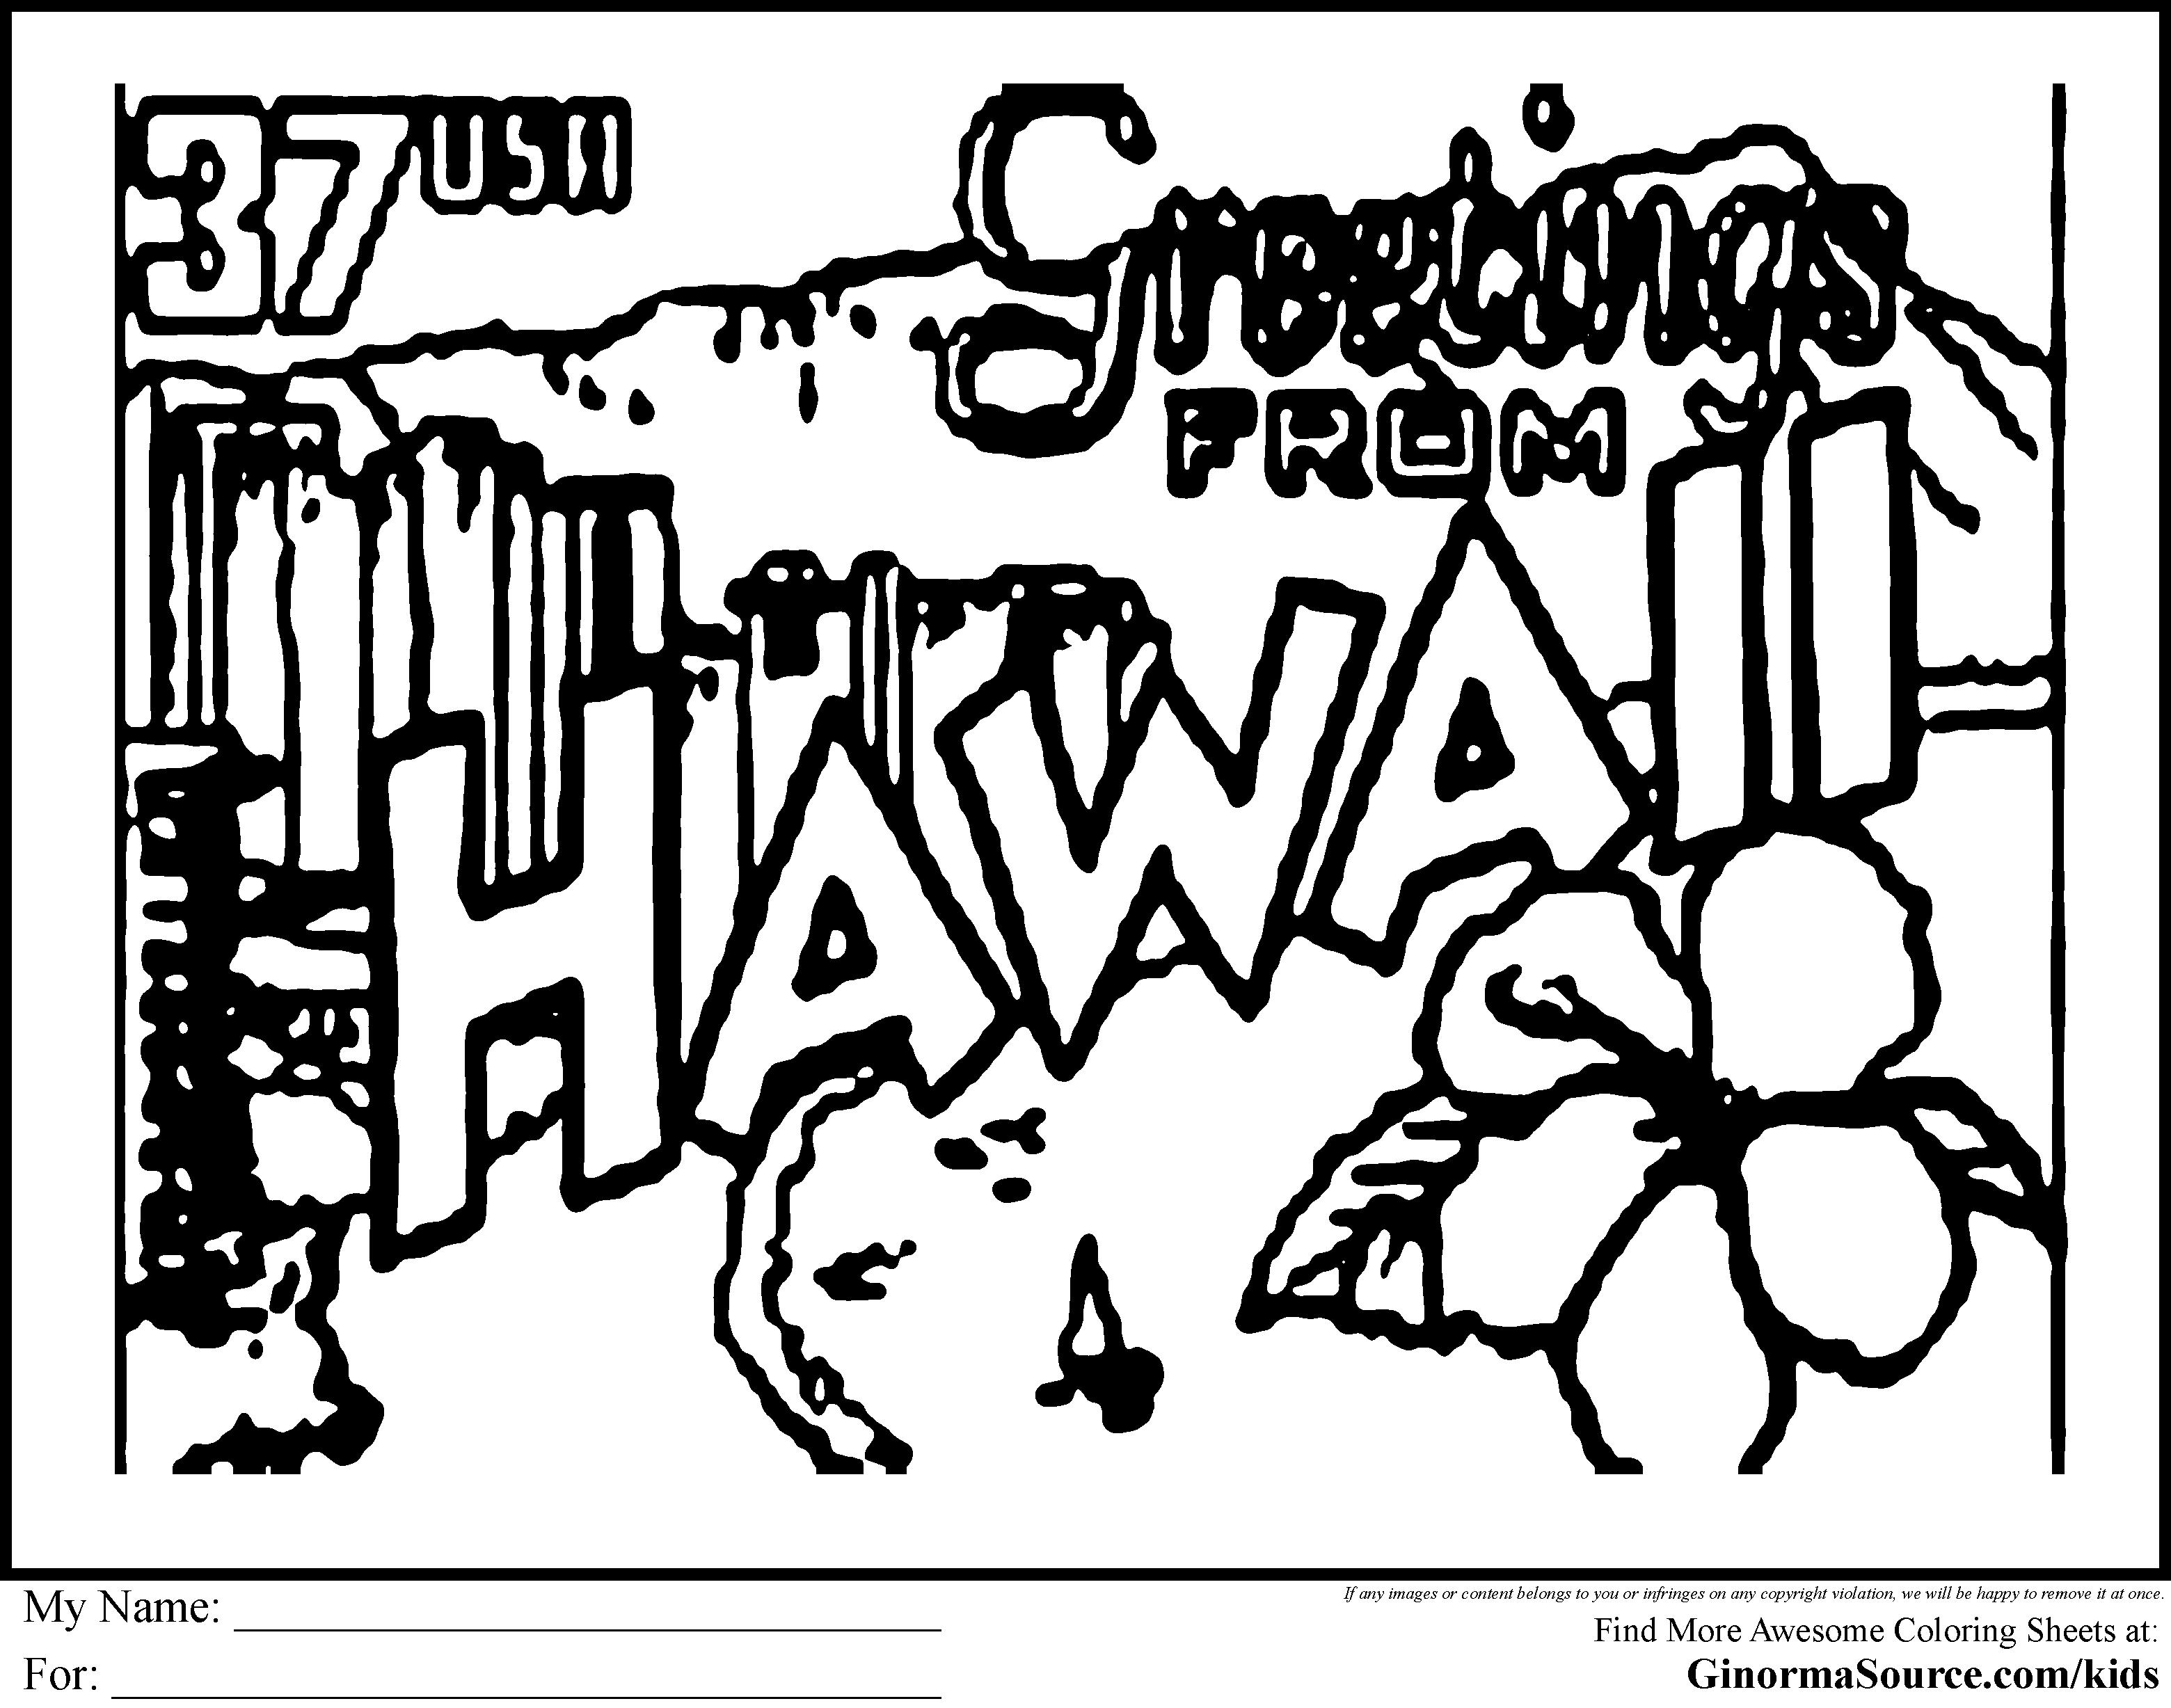 hawaiian tiki mask coloring pages hawaiian mask coloring pages - Tiki Coloring Pages